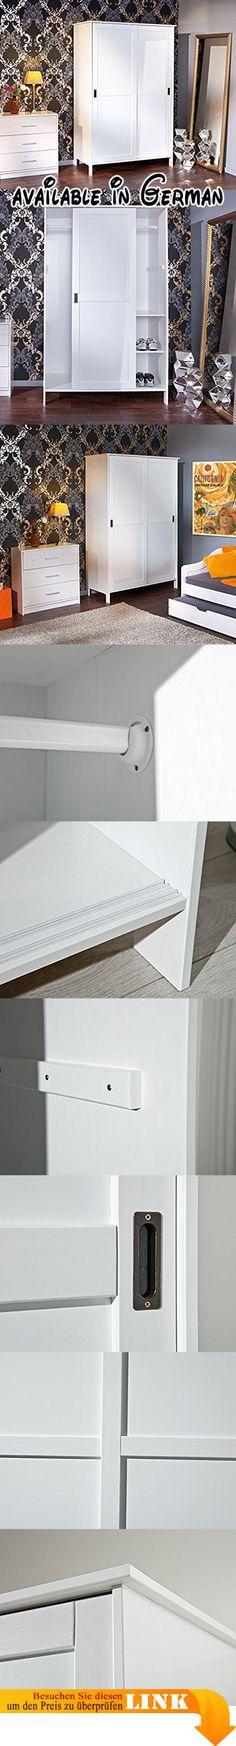 B01GRYZ6HO  Express Möbel Kleiderschrank Schlafzimmerschrank Weiß - schlafzimmerschrank weiß hochglanz